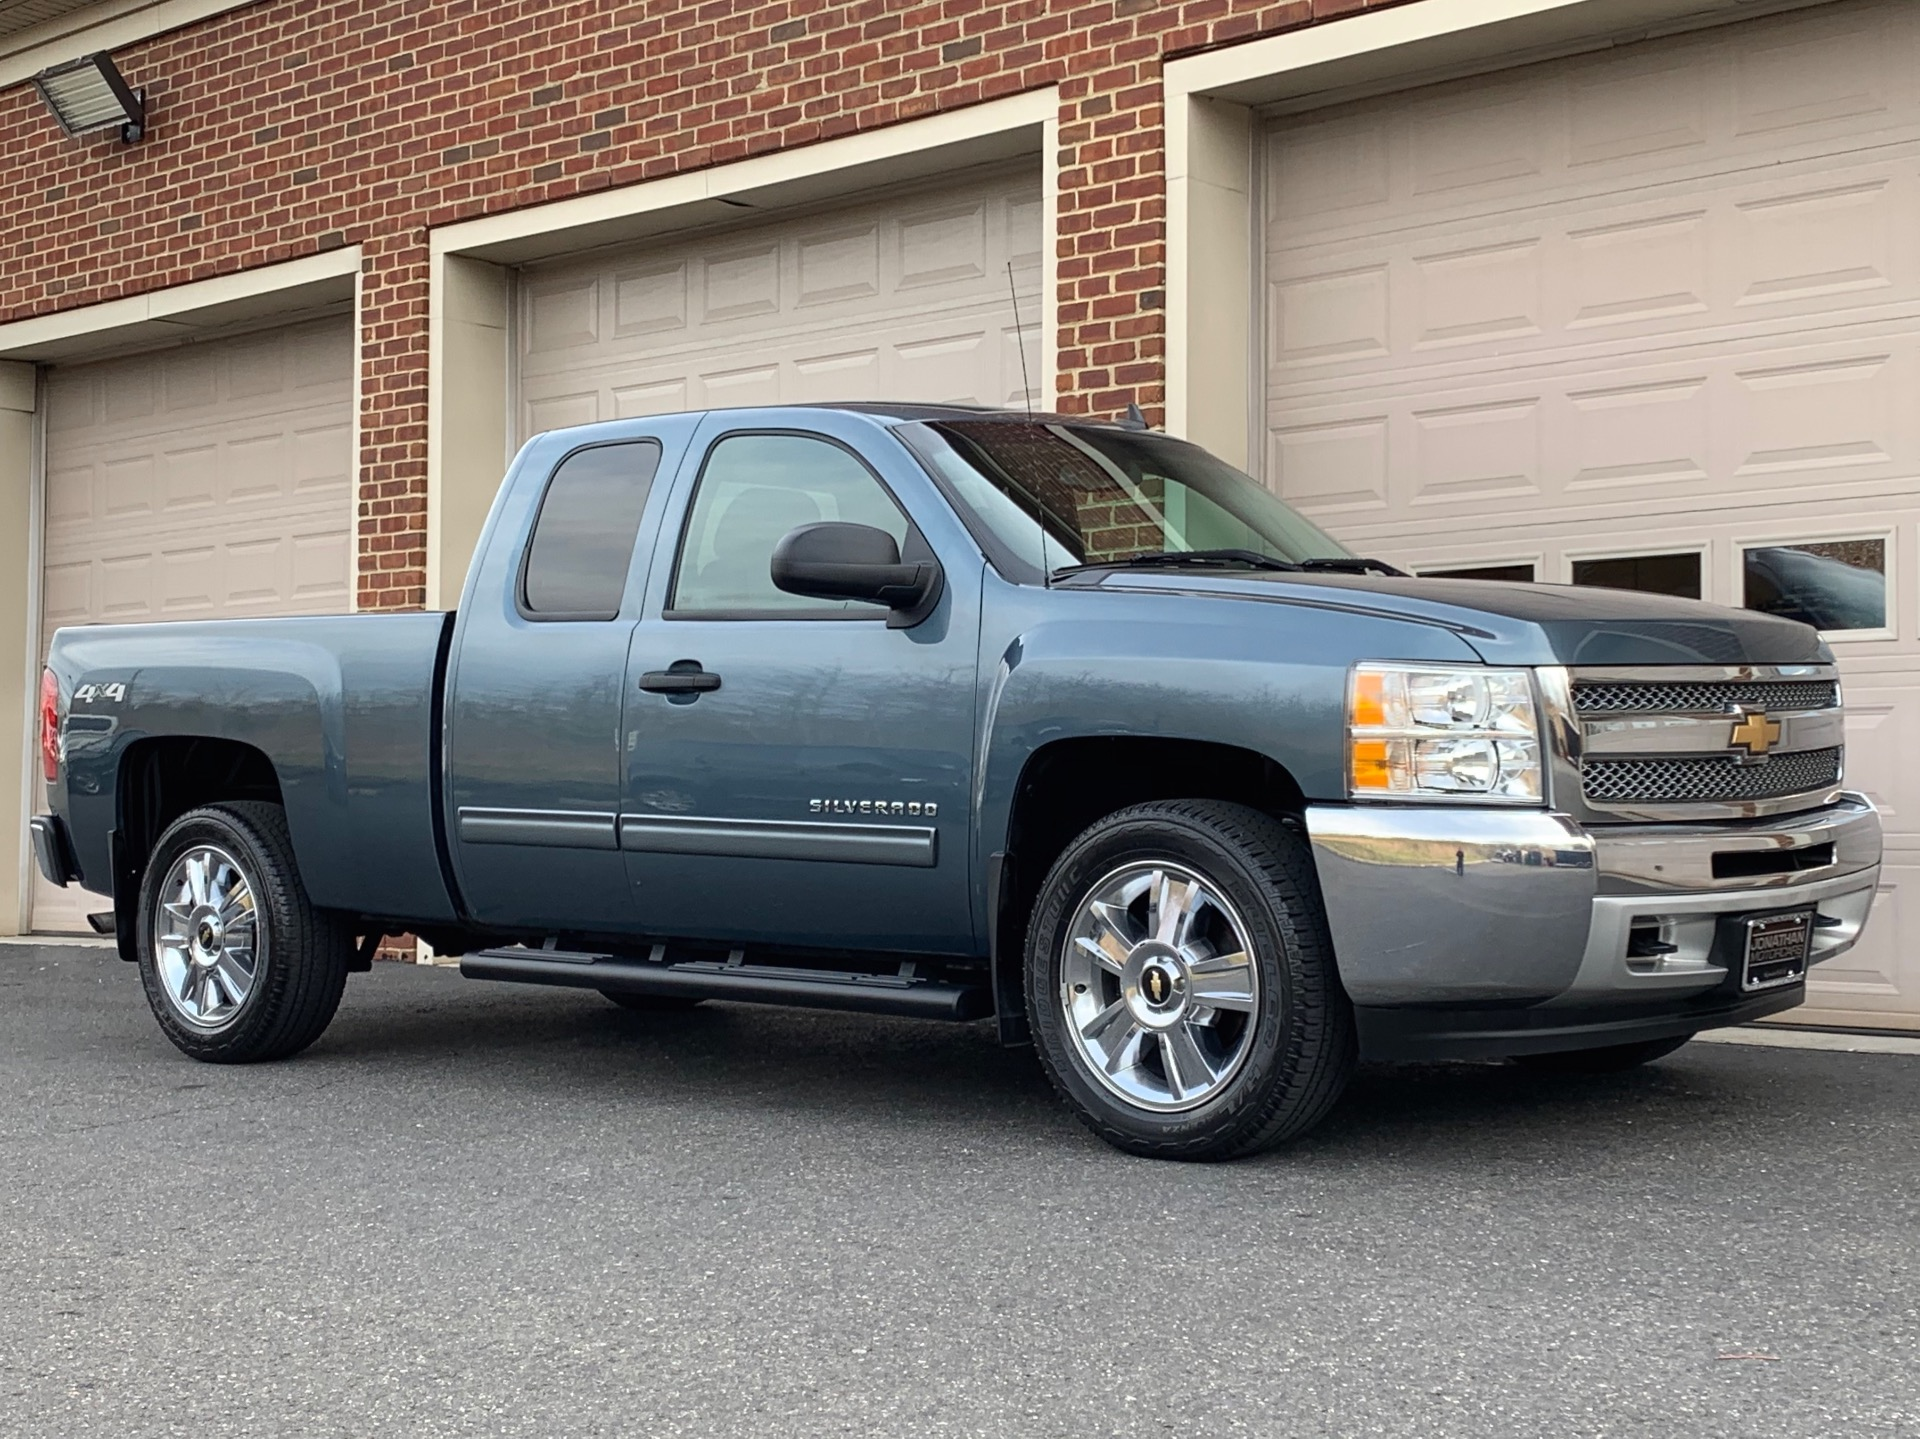 Used-2012-Chevrolet-Silverado-1500-LT